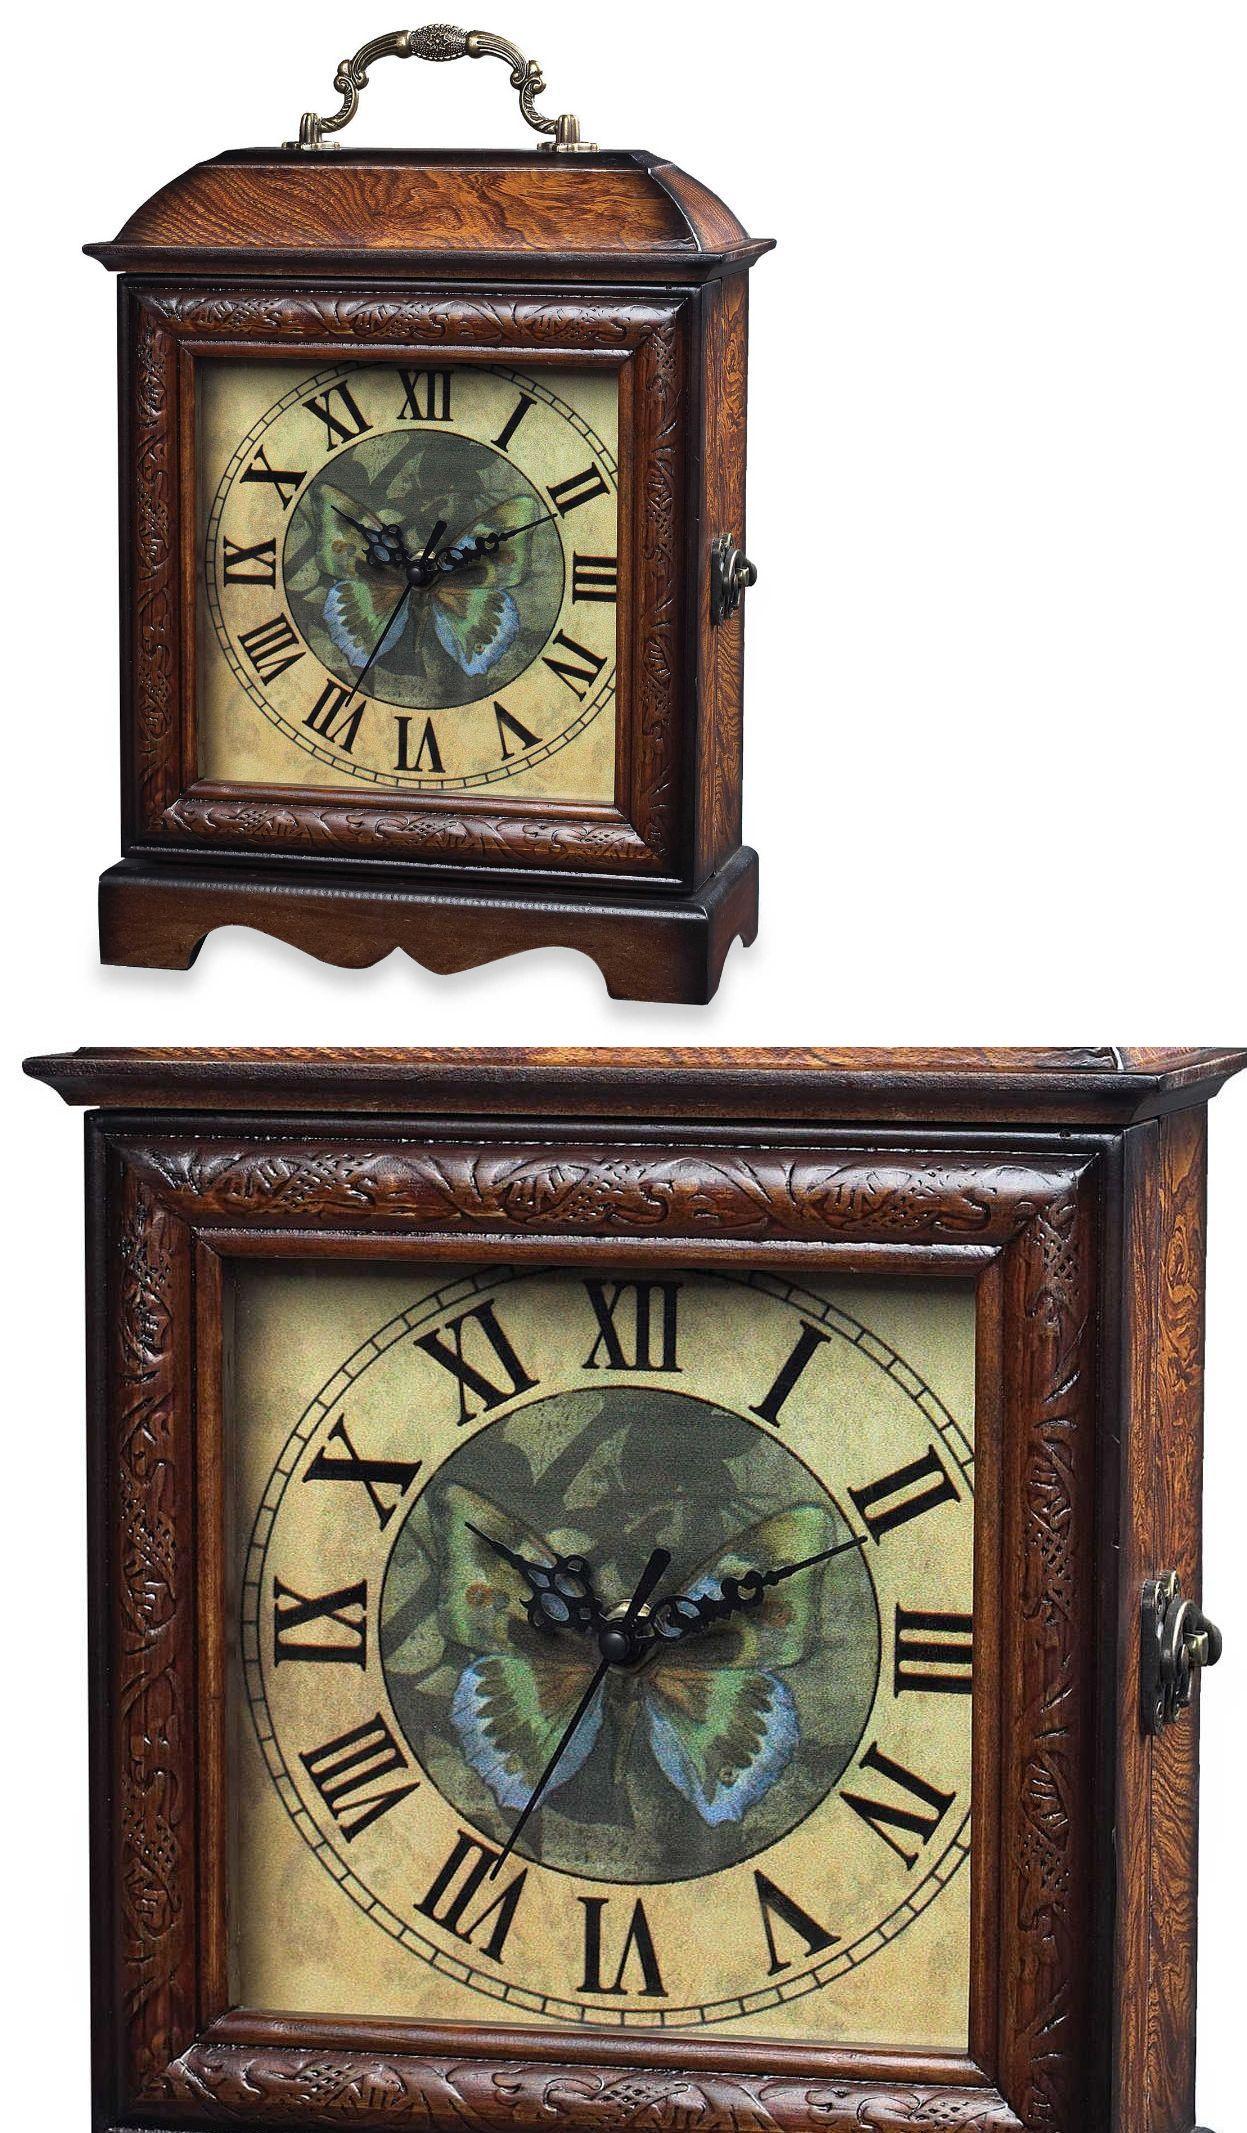 Desk Mantel And Shelf Clocks 175753: Green Butterfly Wood Clock Modern  Tabletop Mantle Desk Table